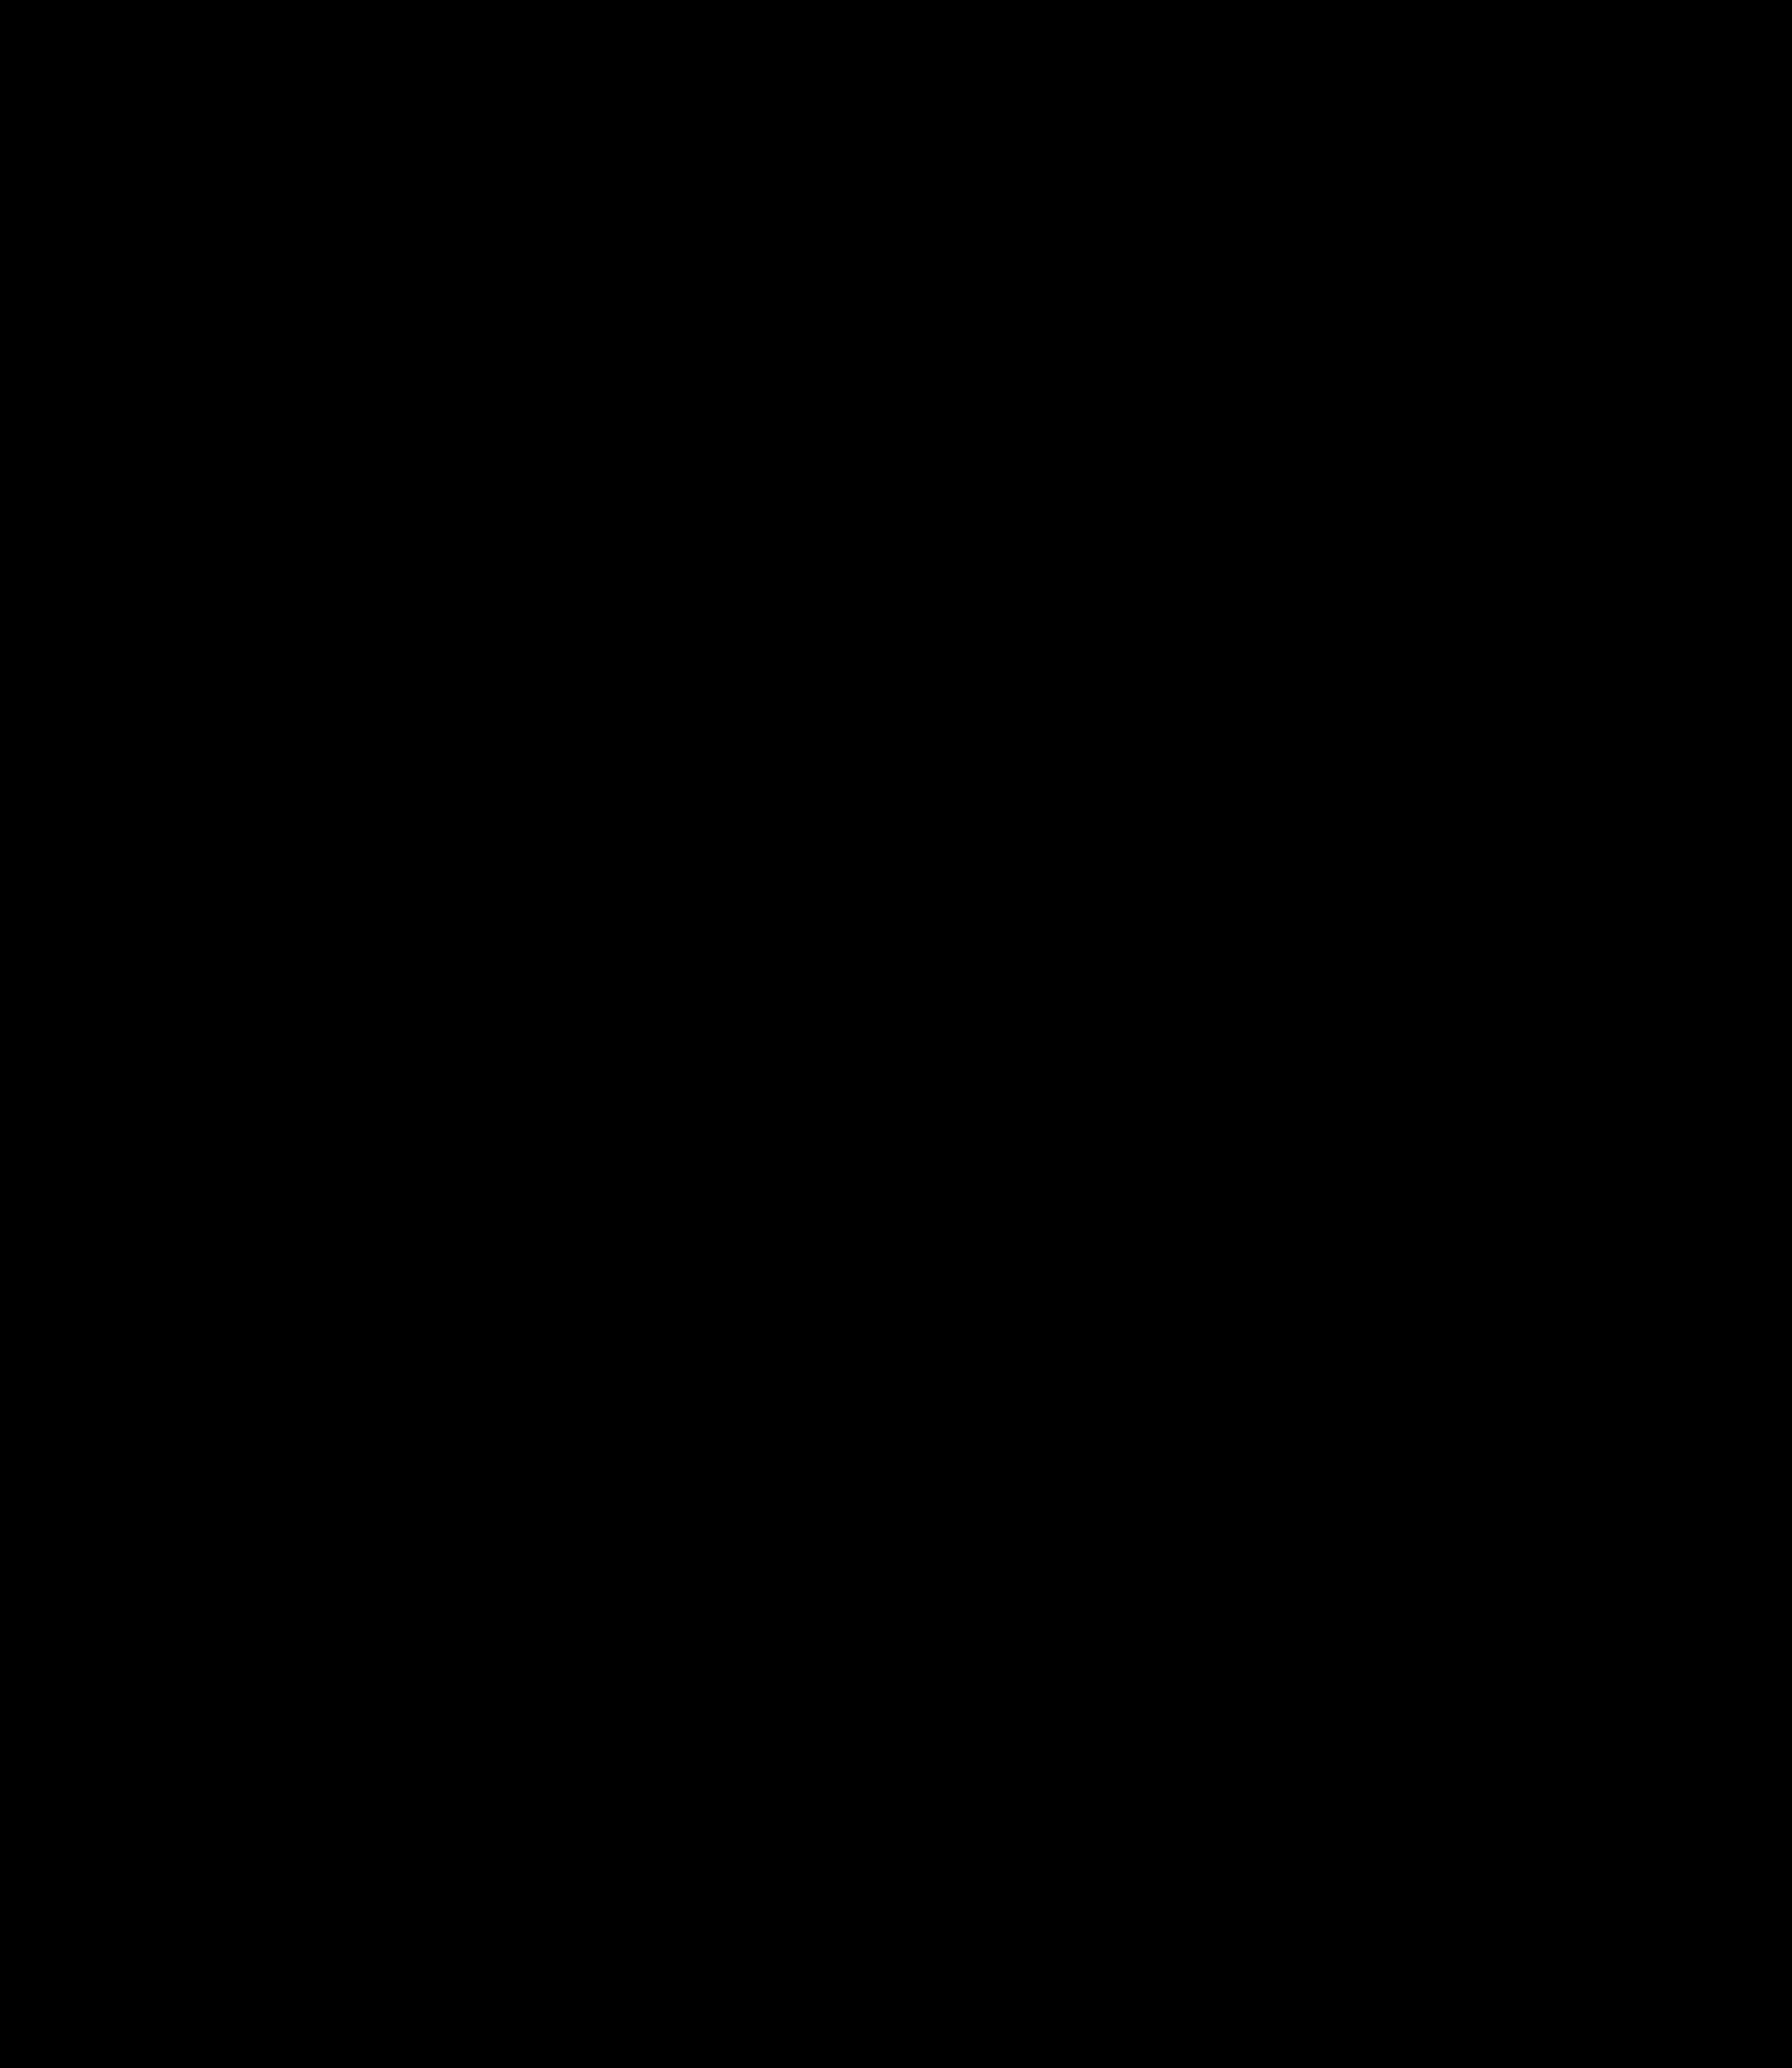 File Black Star Of David Svg Jewish Symbols Star Of David Star Of David Tattoo